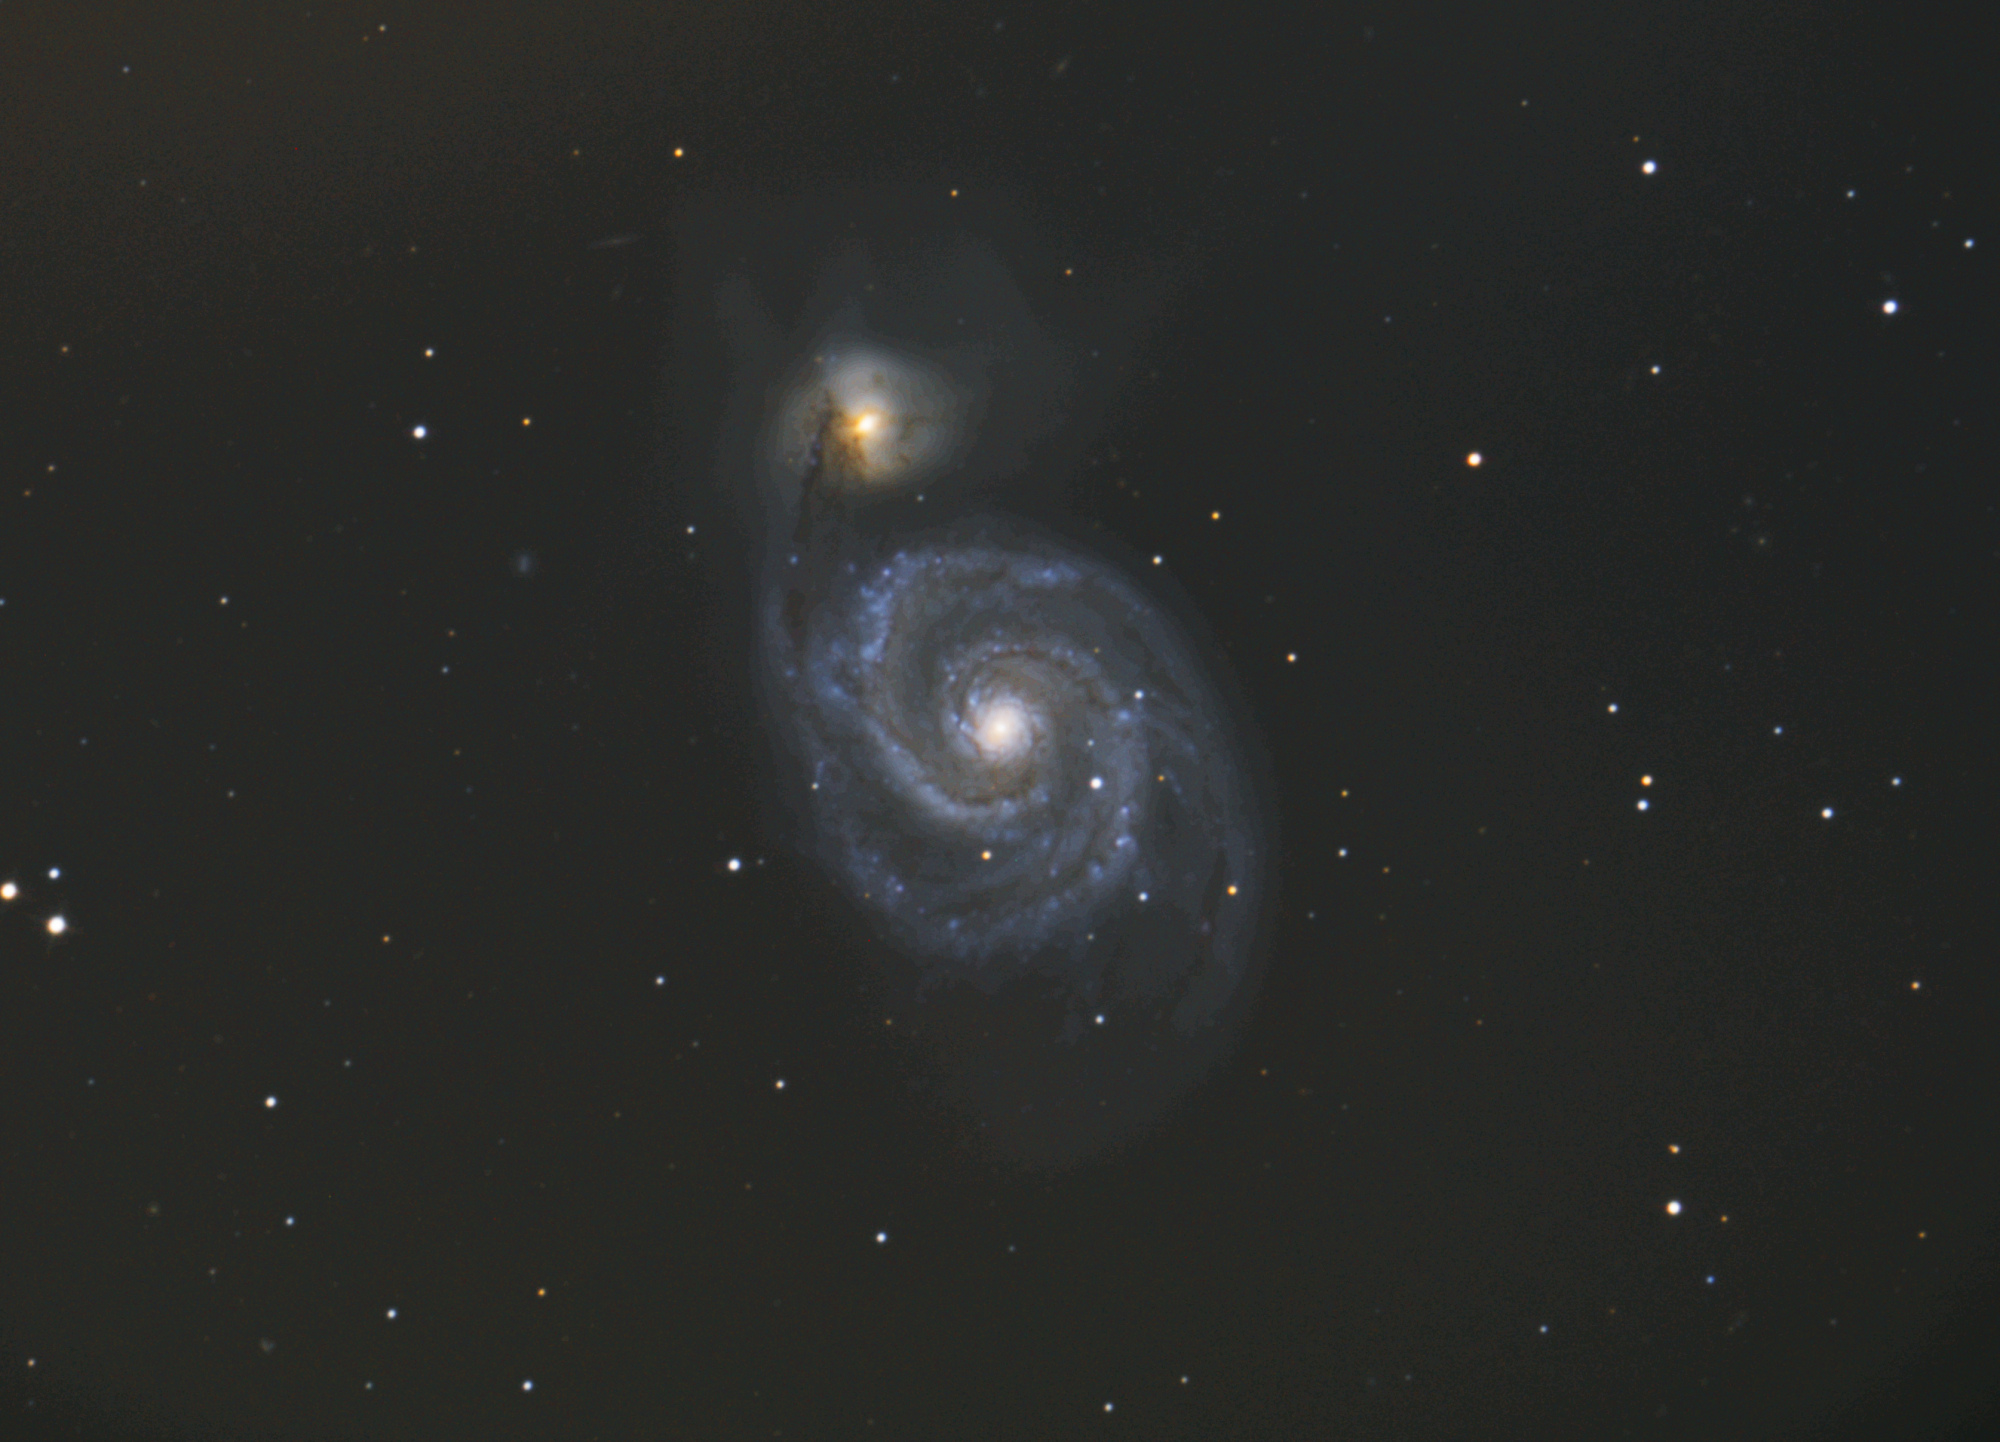 M51-T700-AS.thumb.jpg.142c45bc231ea1c258b7fe3af79947b9.jpg